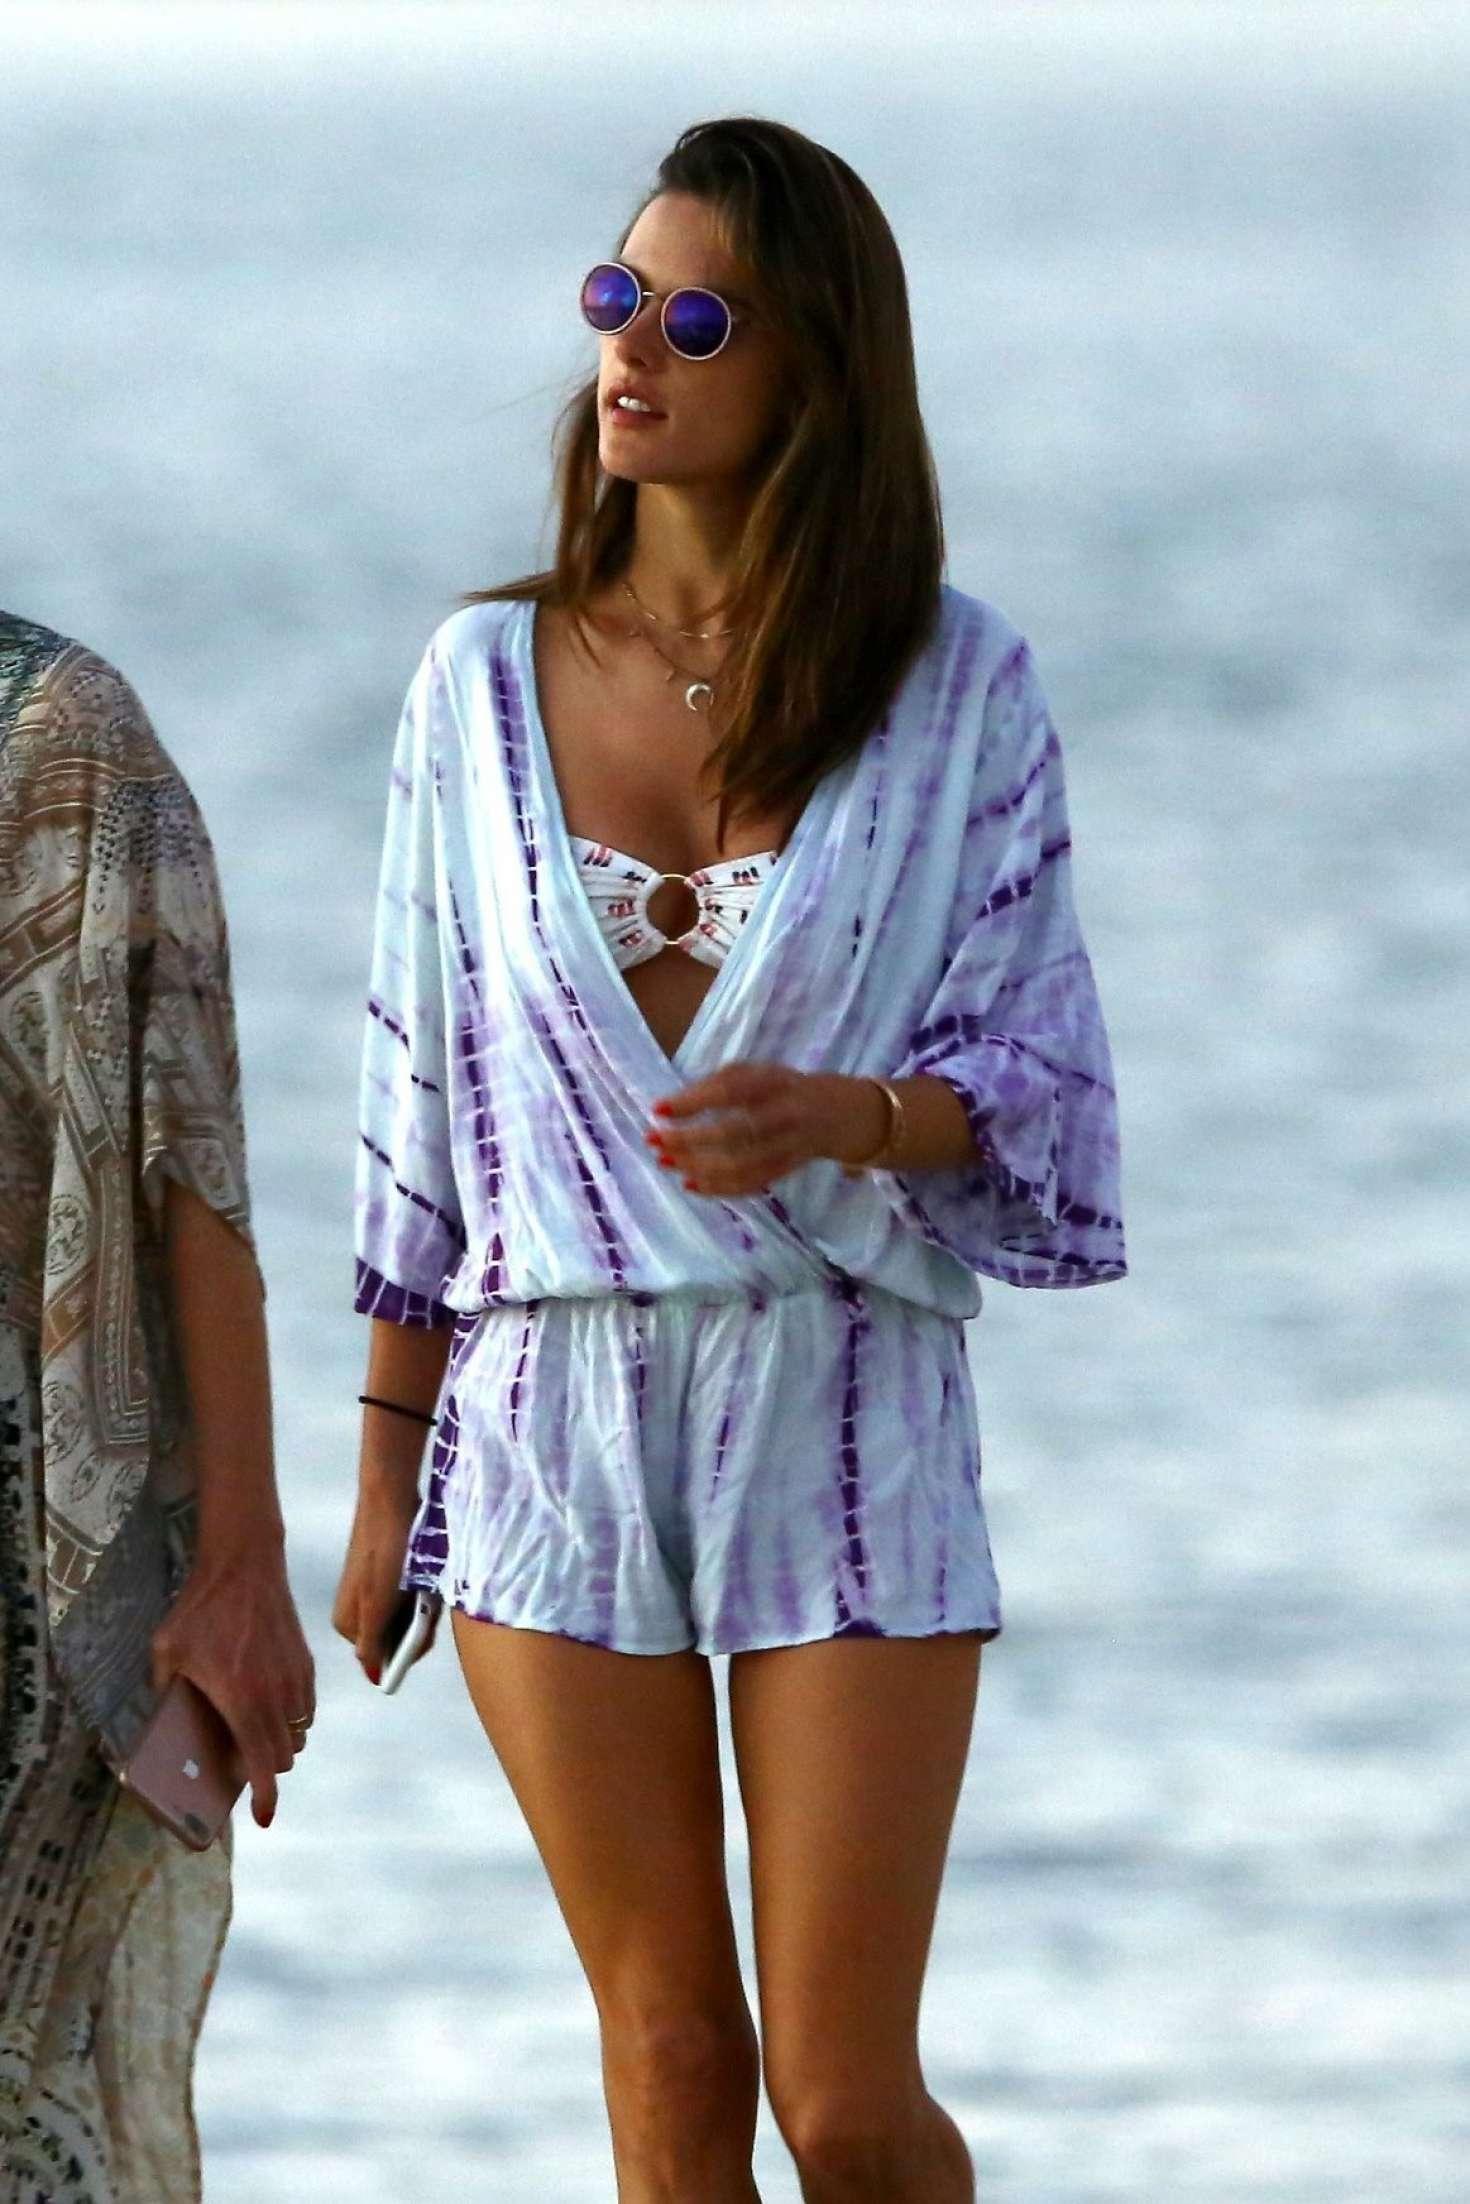 Alessandra Ambrosio on the beach in Florianopolis